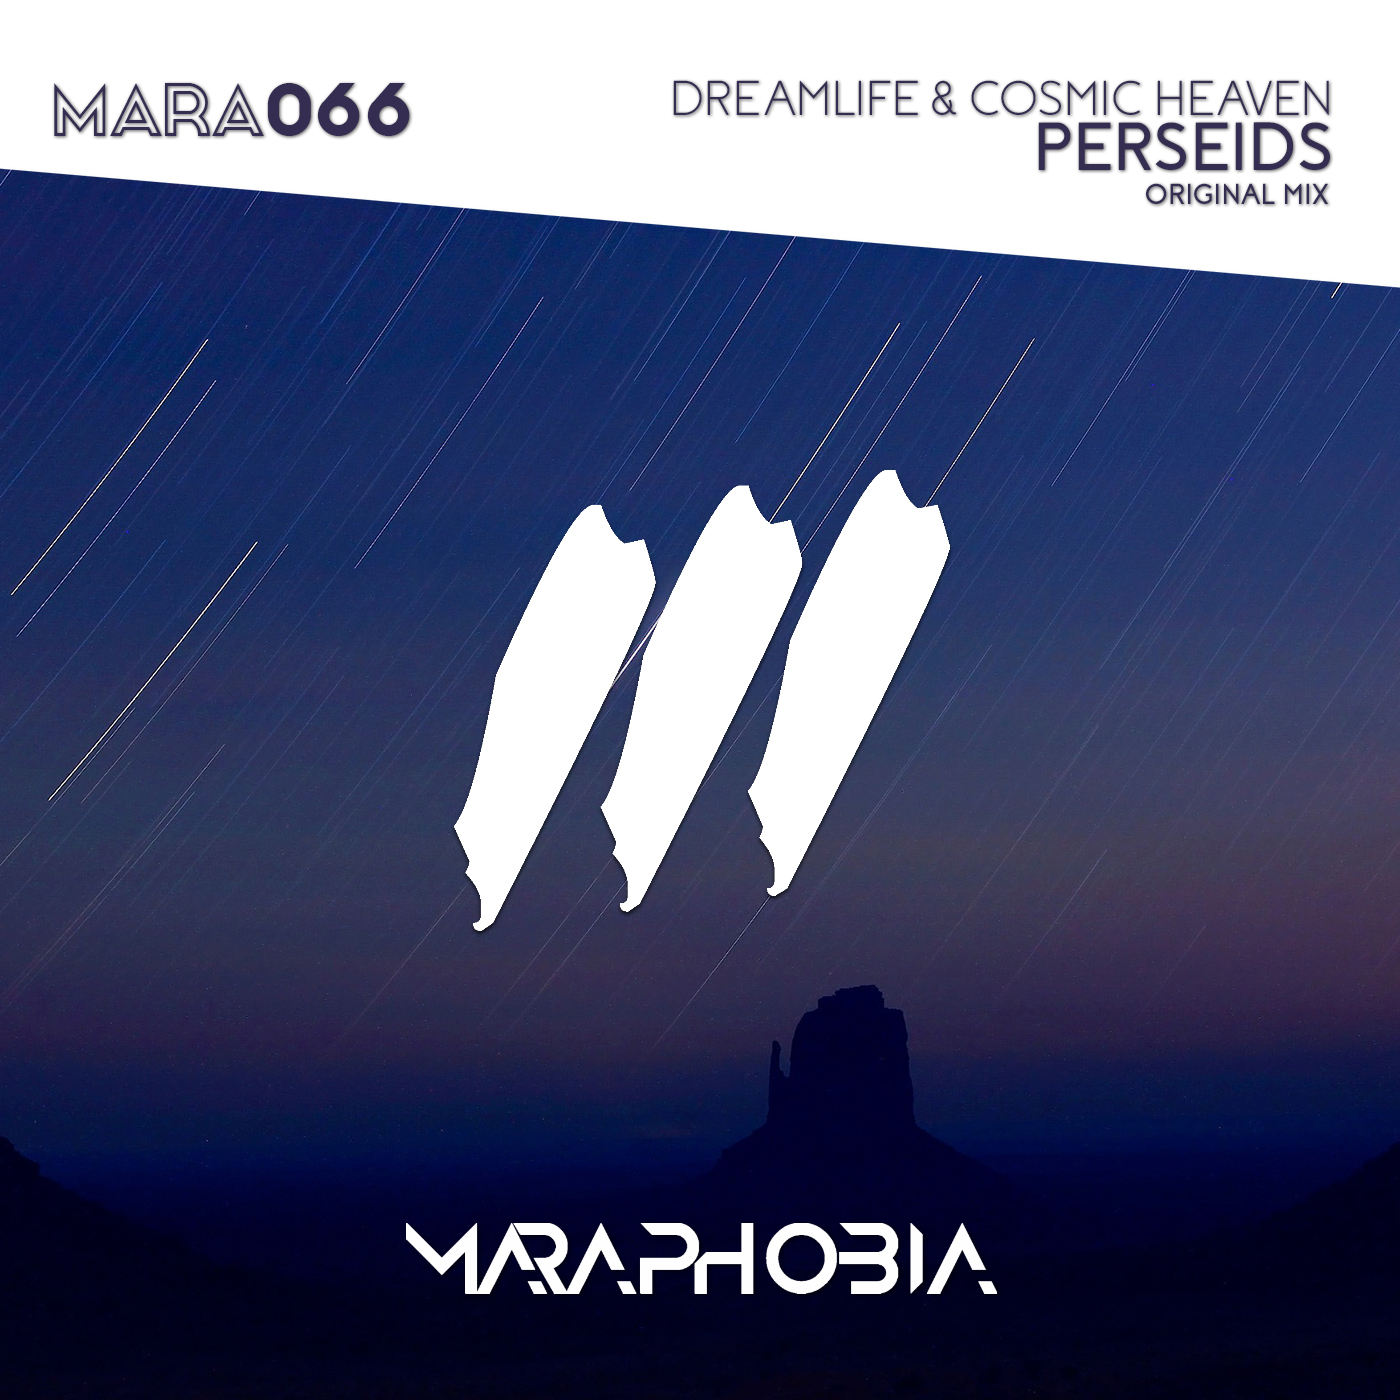 DreamLife & Cosmic Heaven - Perseids (Original Mix)